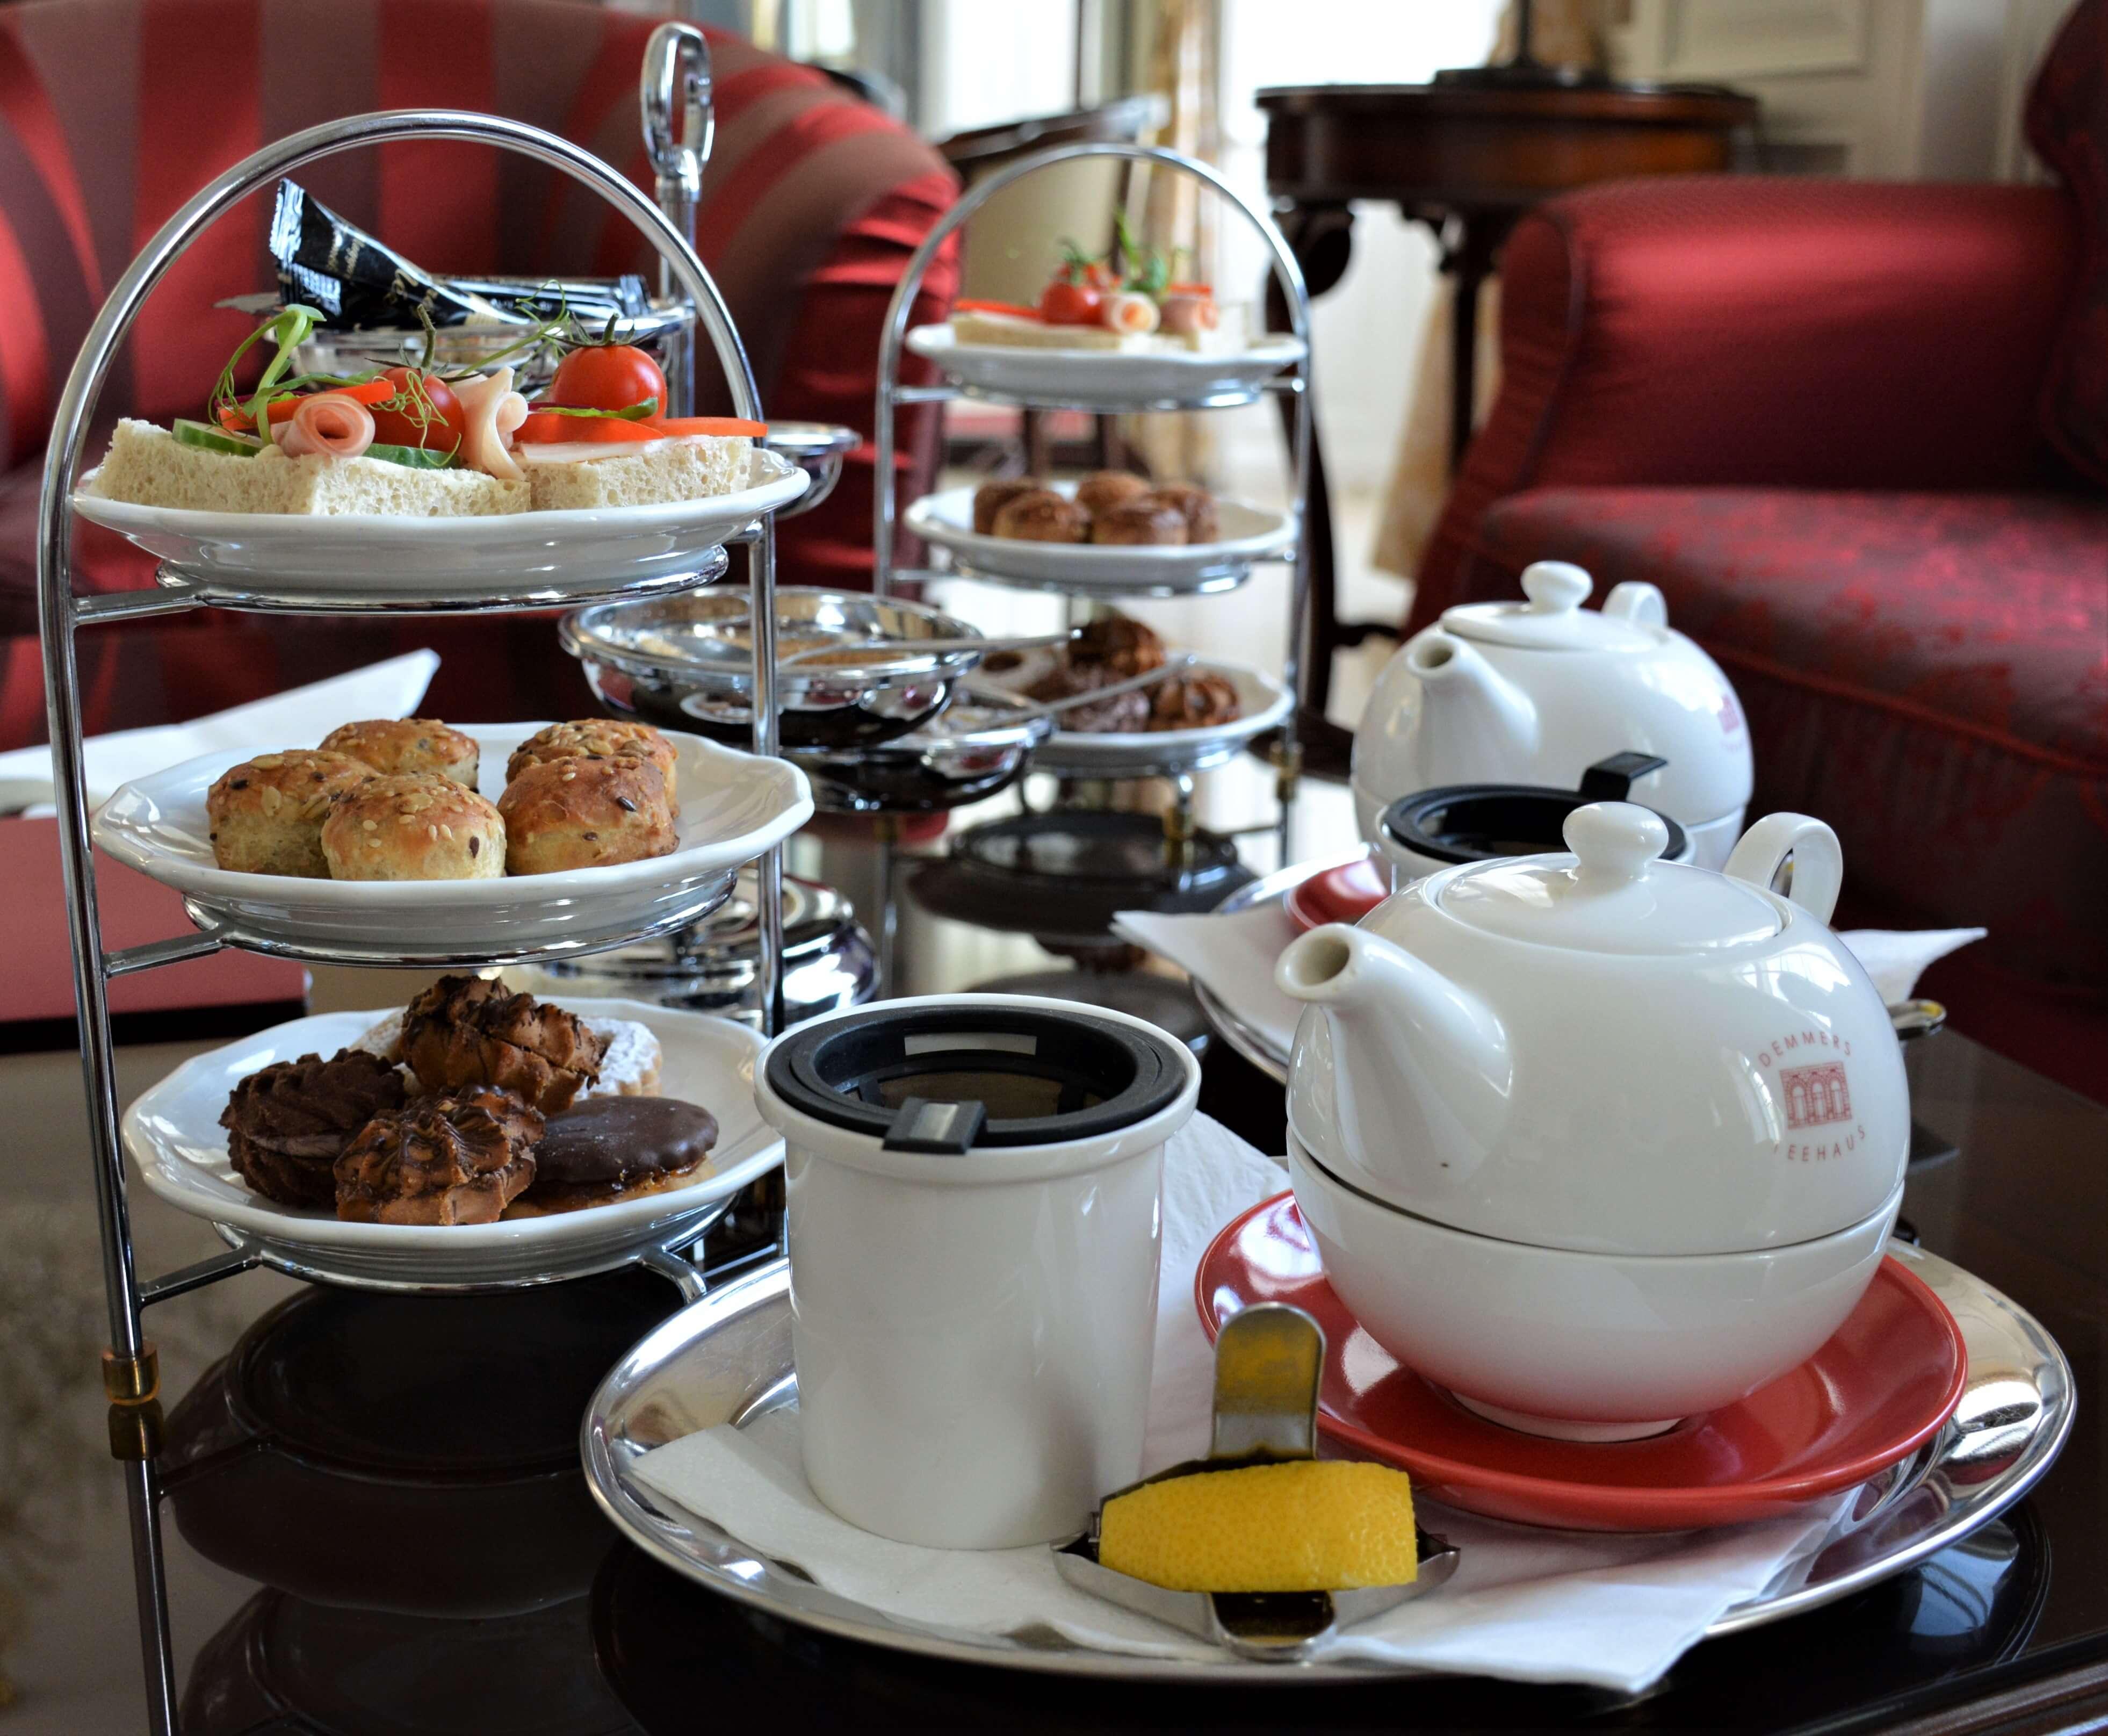 salon de thé de l'hôtel de luxe La Contessa